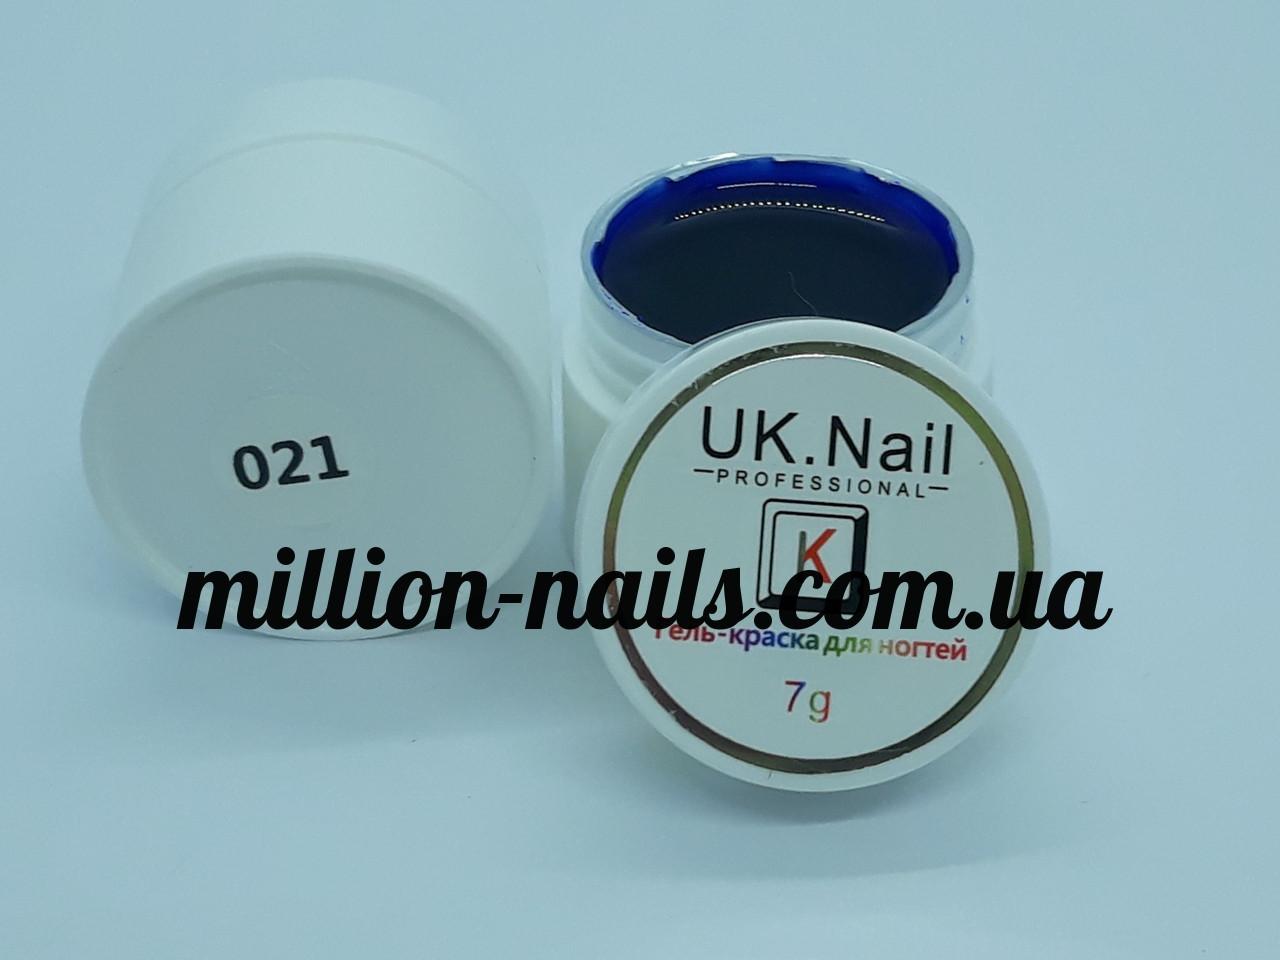 Гель-краска  для ногтей UK.Nail №21 цвет синий электрик ,7 грамм